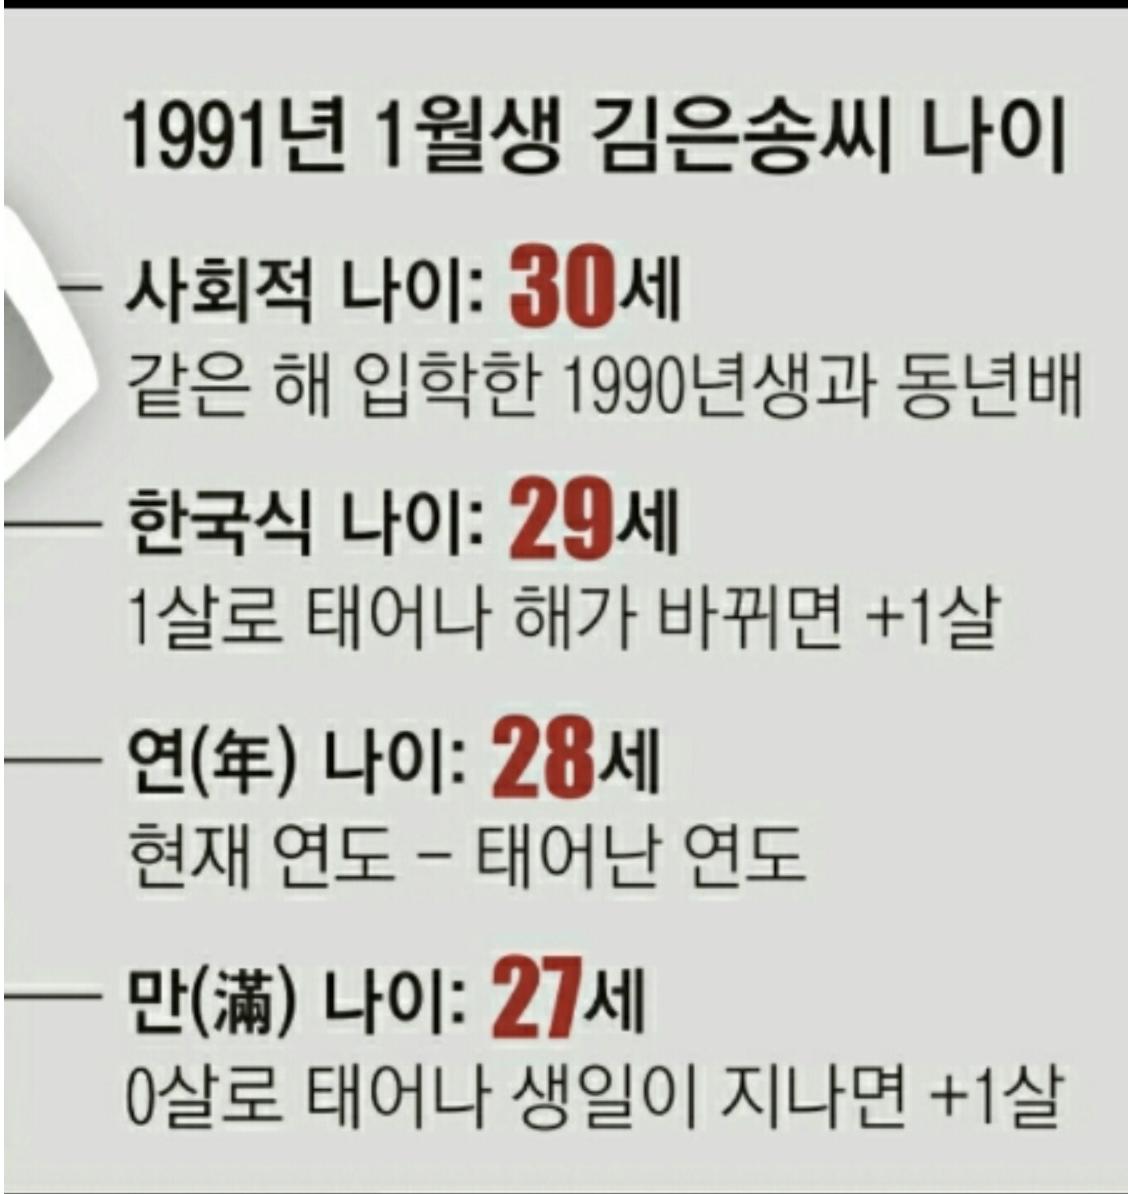 Complex Korean age system - K-POP, K-FANS